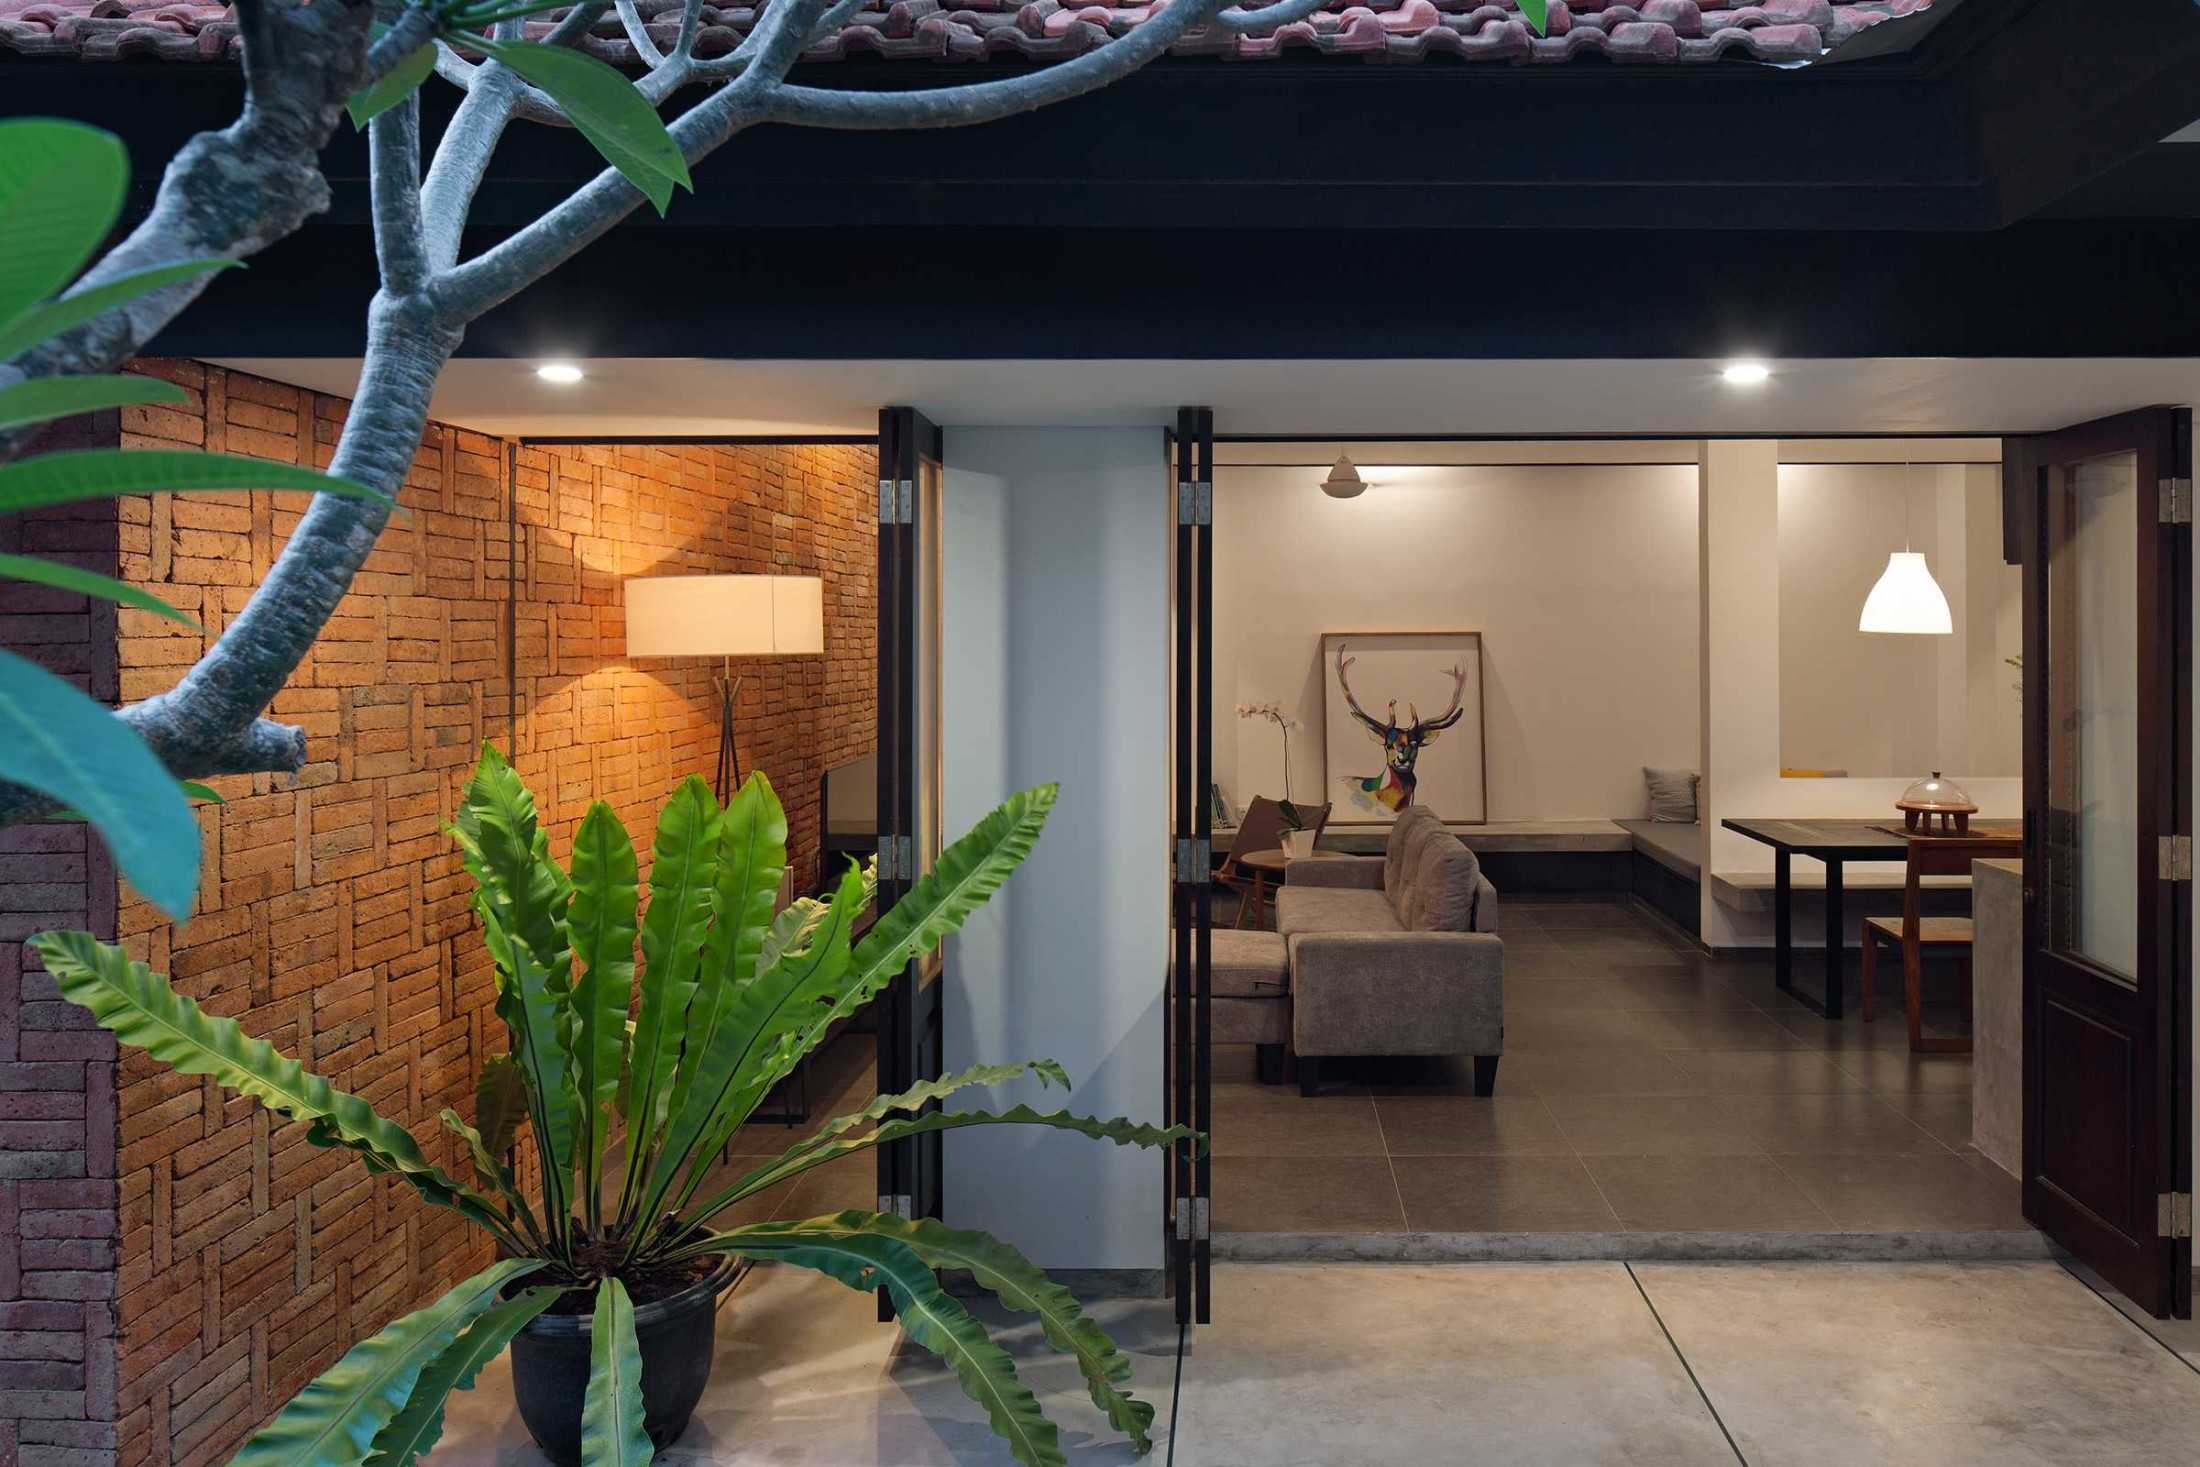 Somia Design Mandanila House Jl. Ciungwanara Ii, Renon, Denpasar Sel., Kota Denpasar, Bali, Indonesia Jl. Ciungwanara Ii, Renon, Denpasar Sel., Kota Denpasar, Bali, Indonesia Somia-Design-Mandanila-House  60214